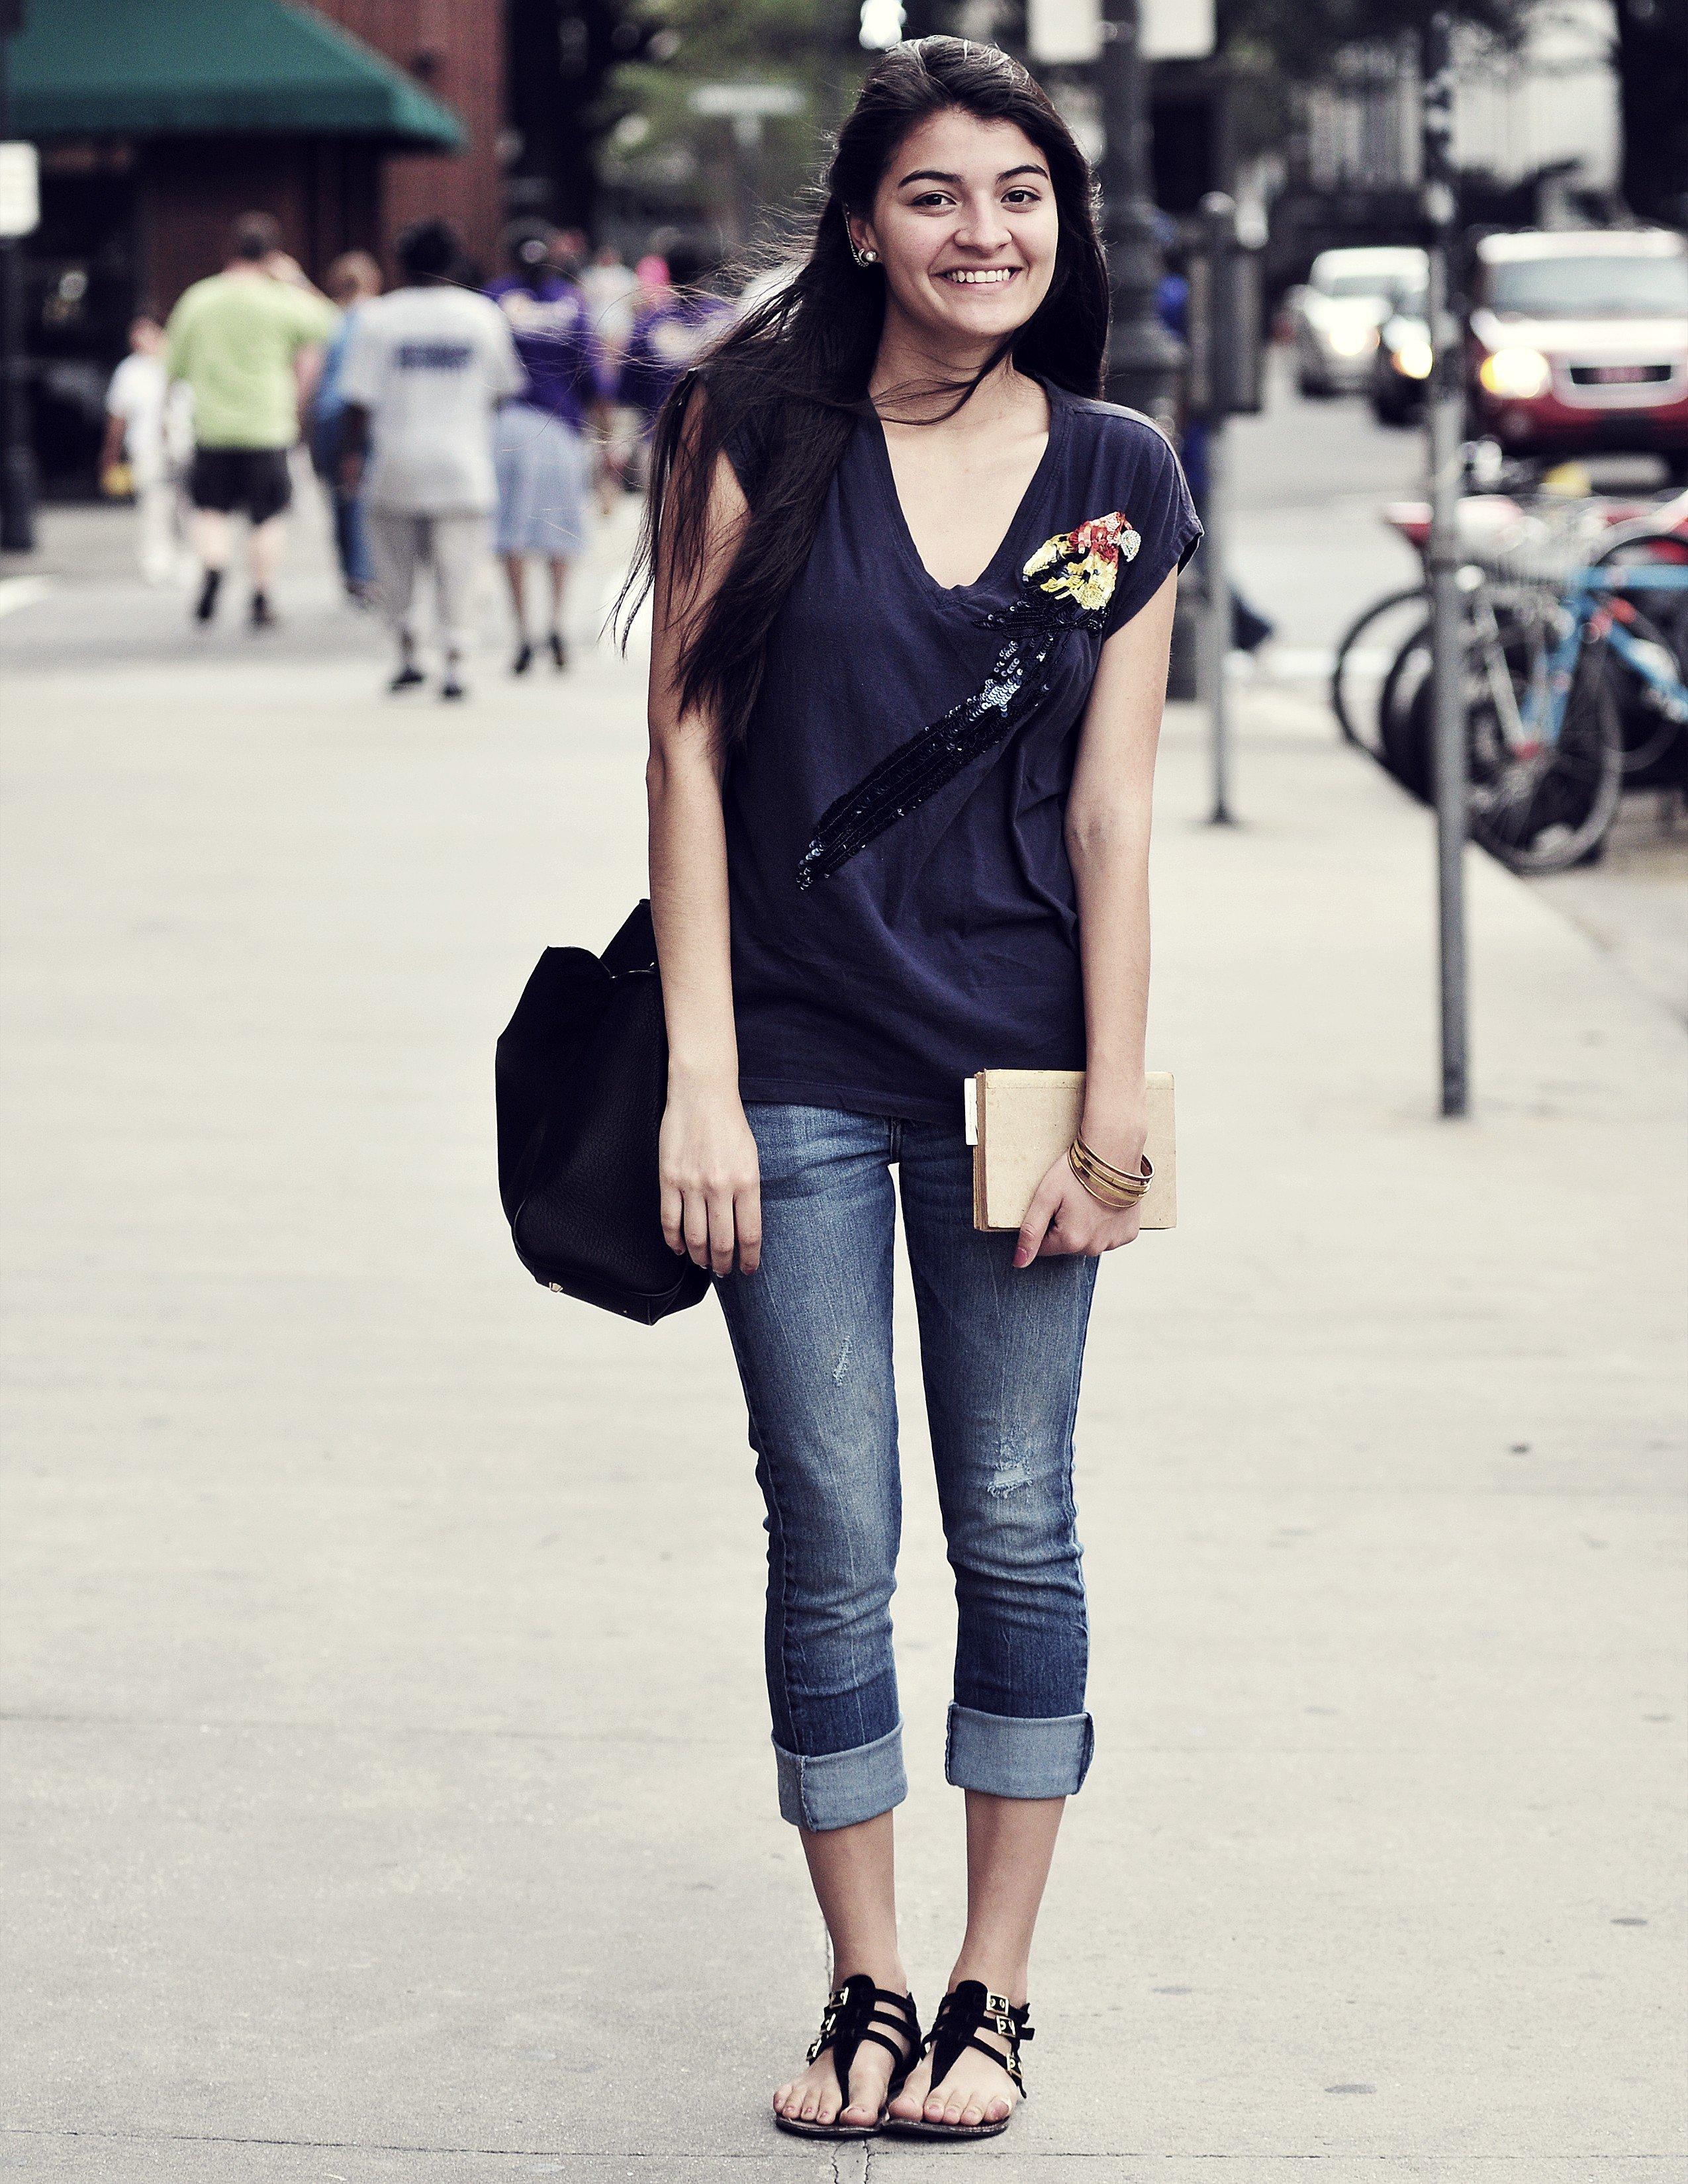 college-fashioncedric_smith_2012_scad_001.jpg